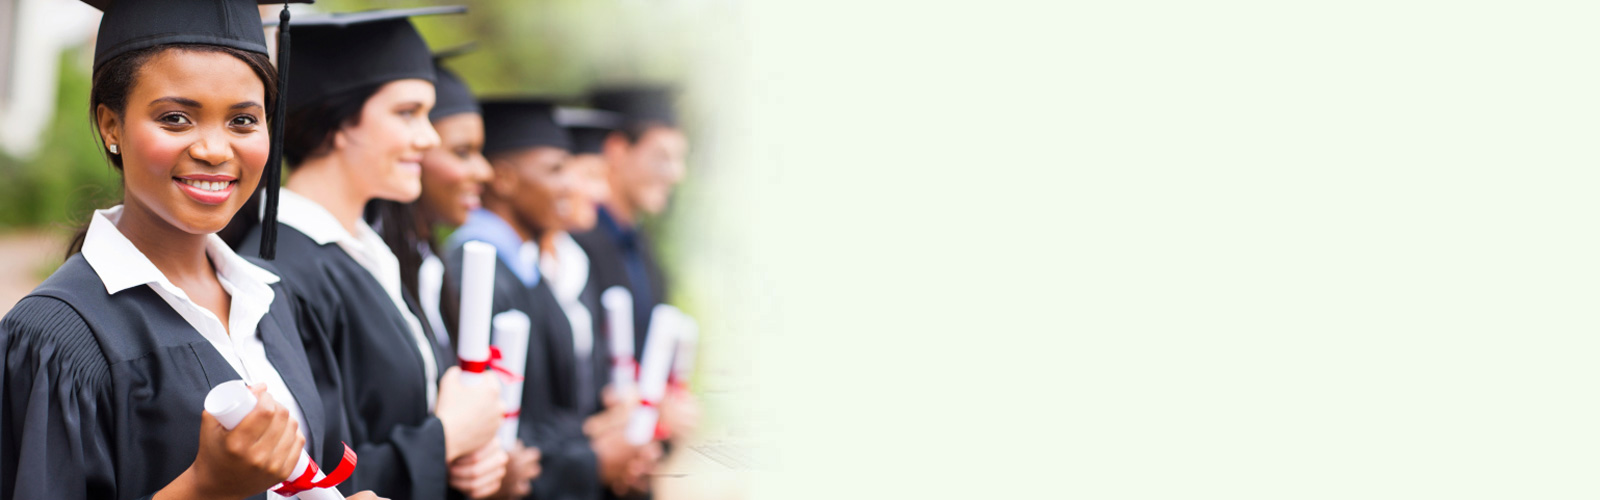 Ruth Cane Graduates Students